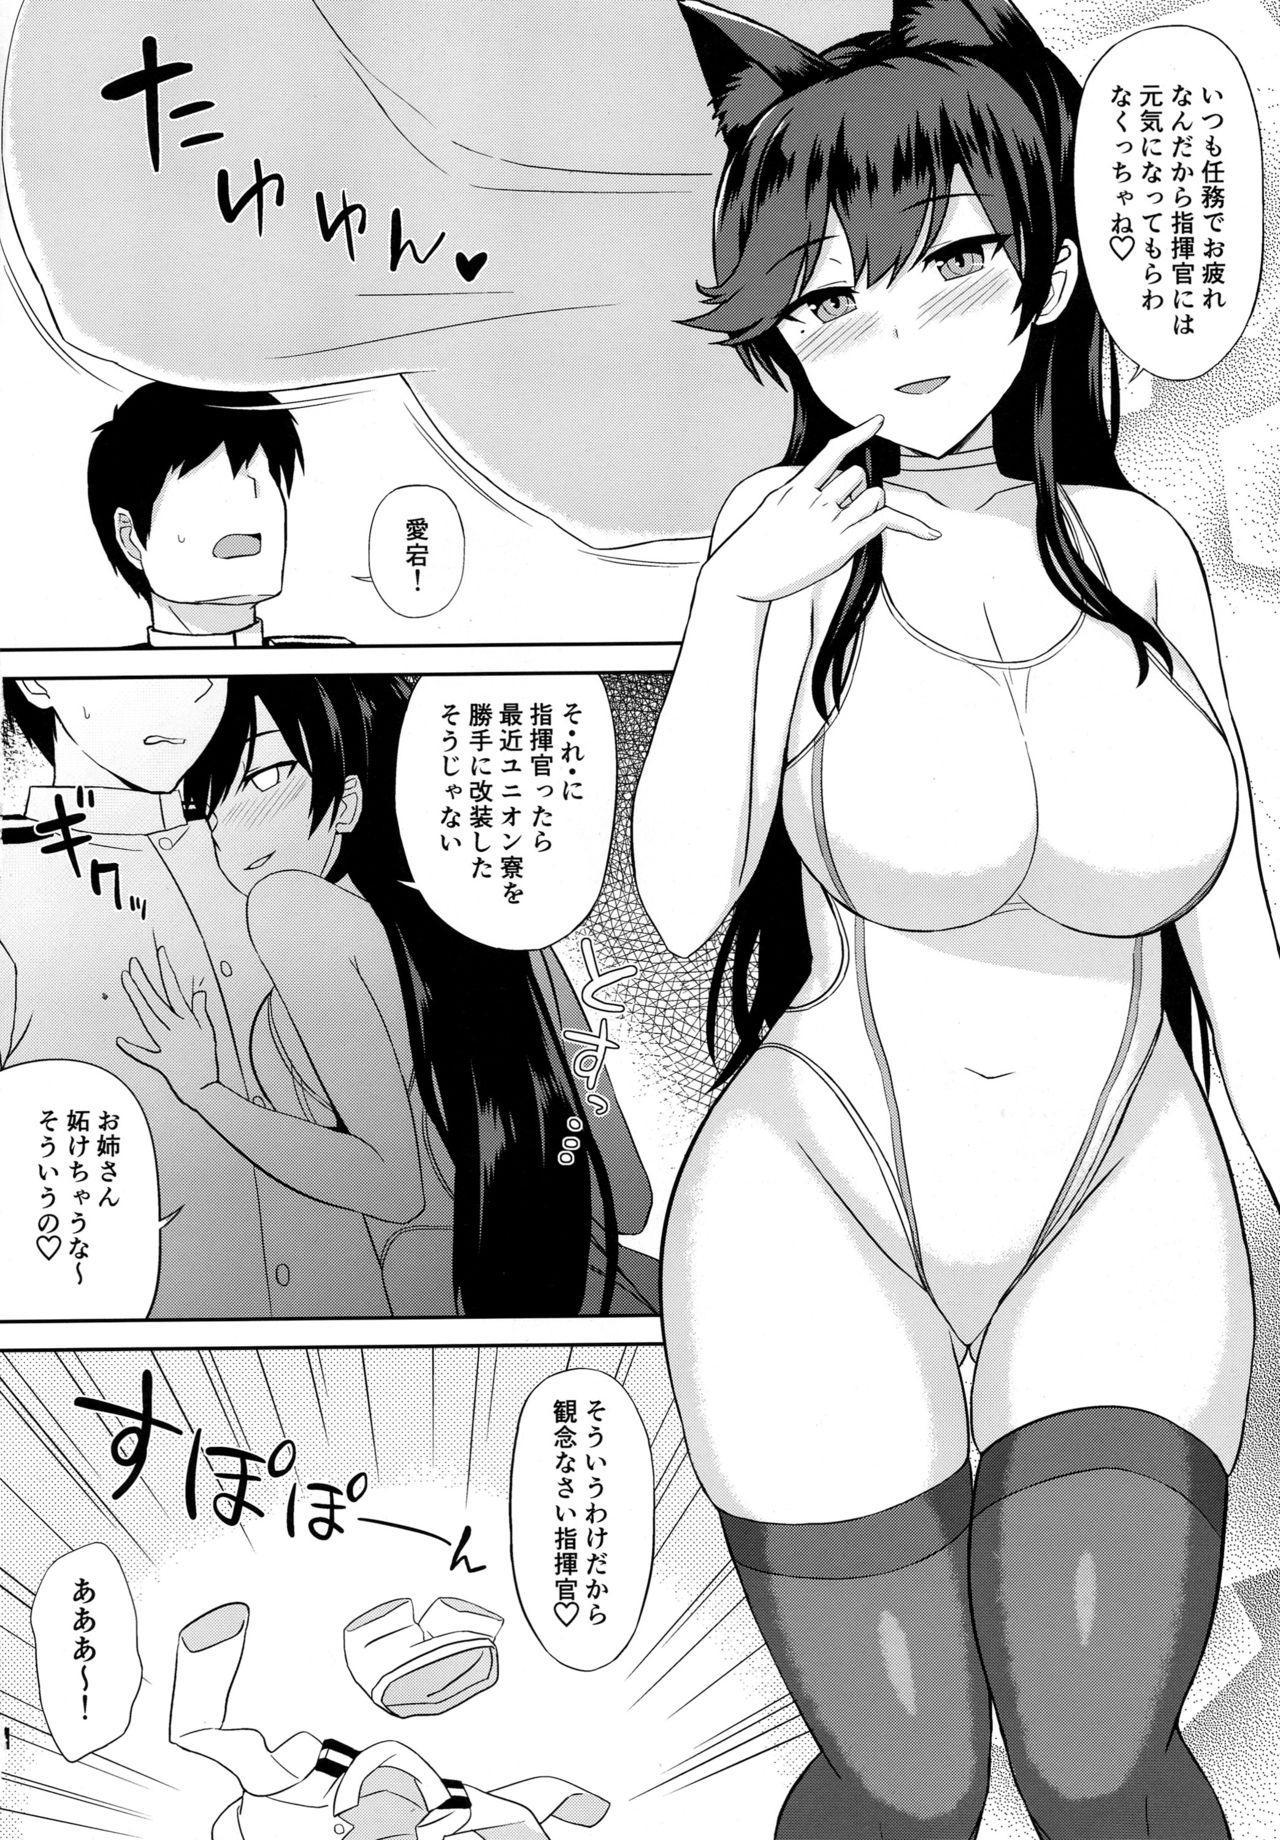 (C95) [Kaki no Tane (Summer)] AzuLan Soap-bu -Juuou Hen- (Azur Lane) 3